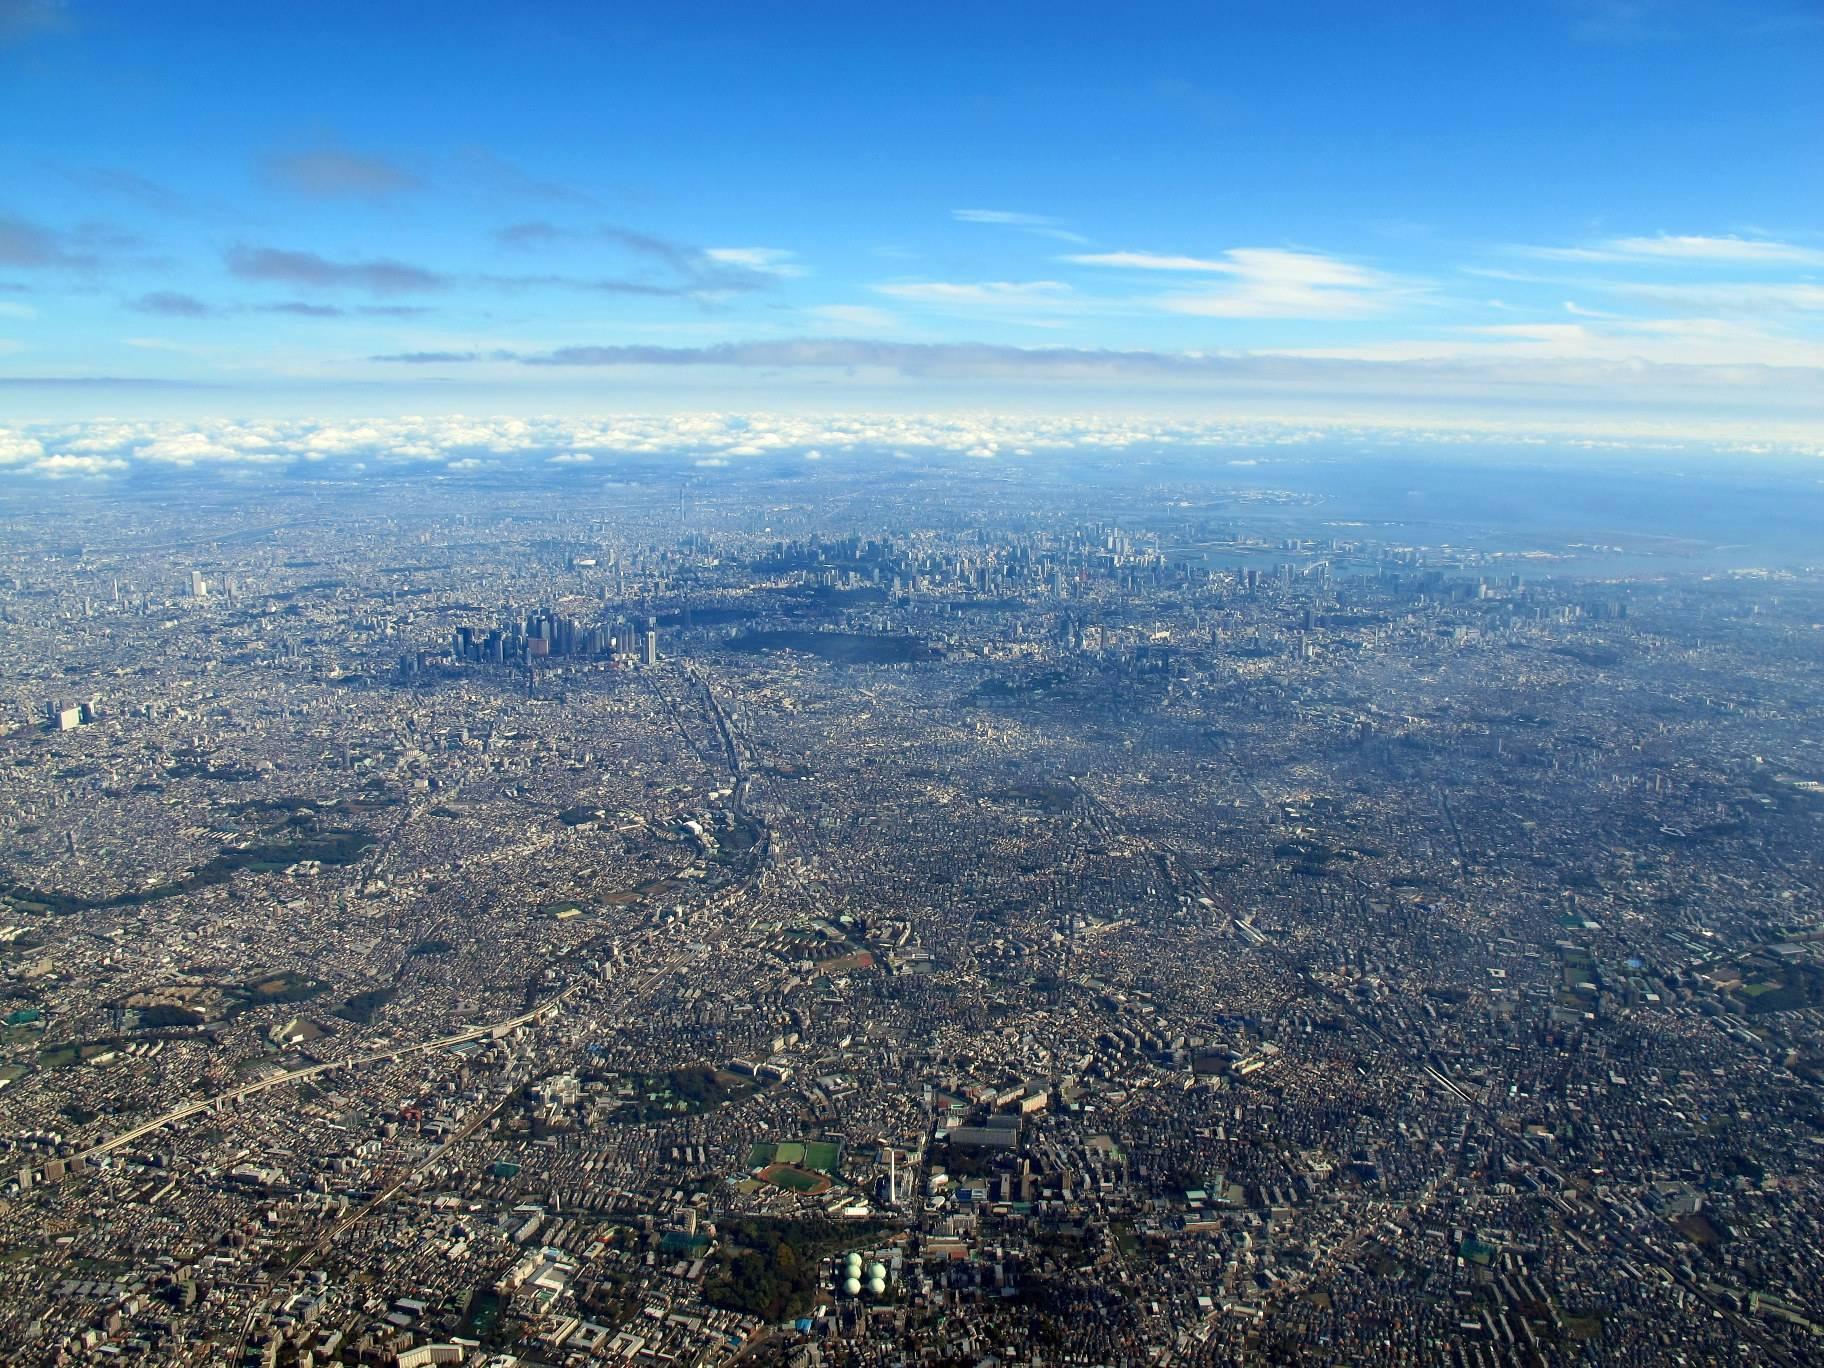 23 - Tokyo population: 13.35 million